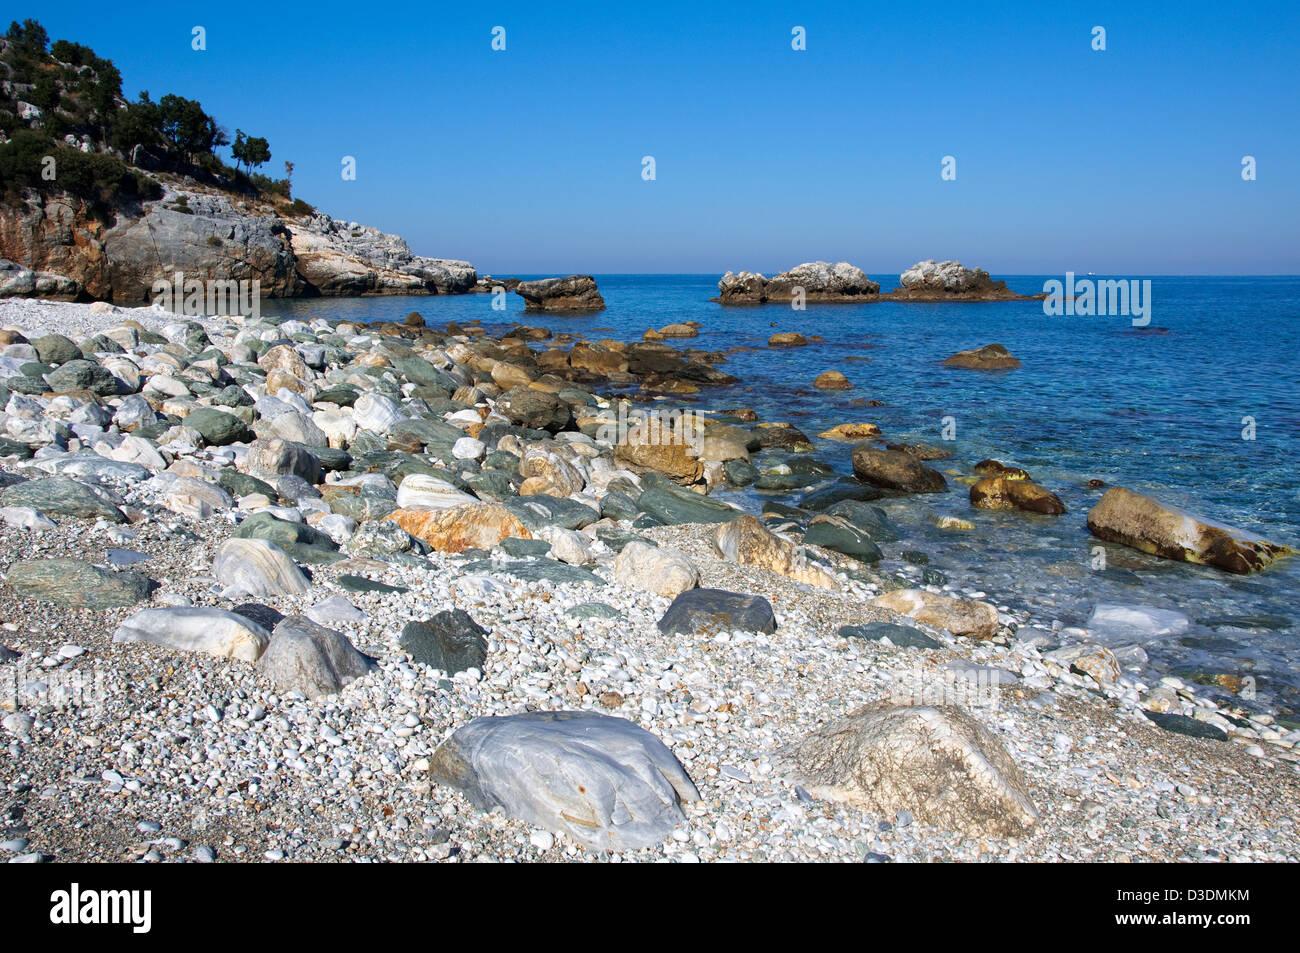 Beach of Damouchari (Pelion Peninsula, Thessaly, Greece) - Stock Image